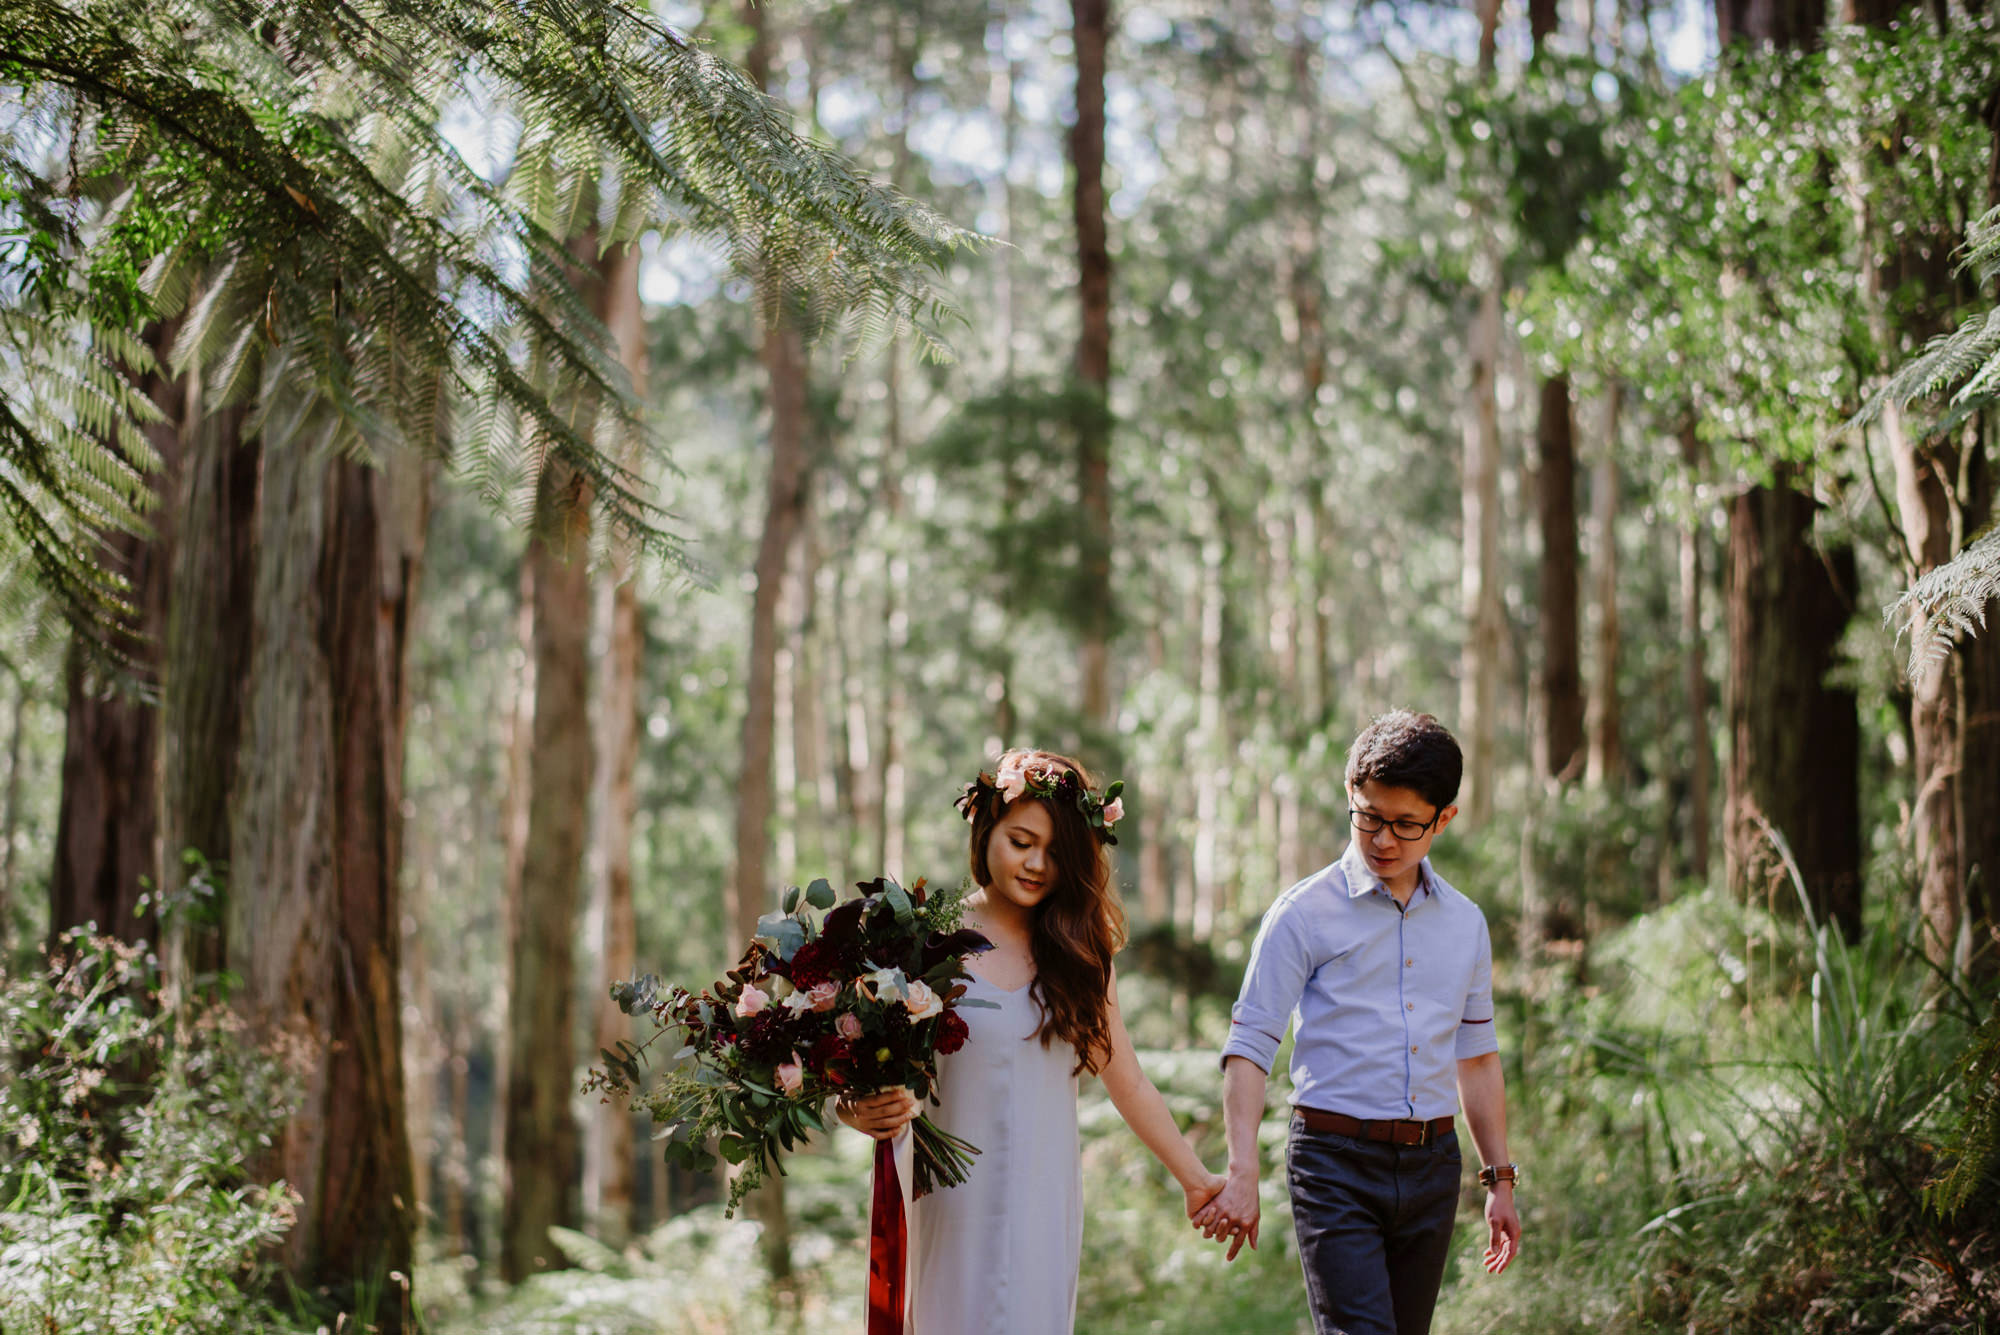 019-melbourne-engagement-wedding-photography